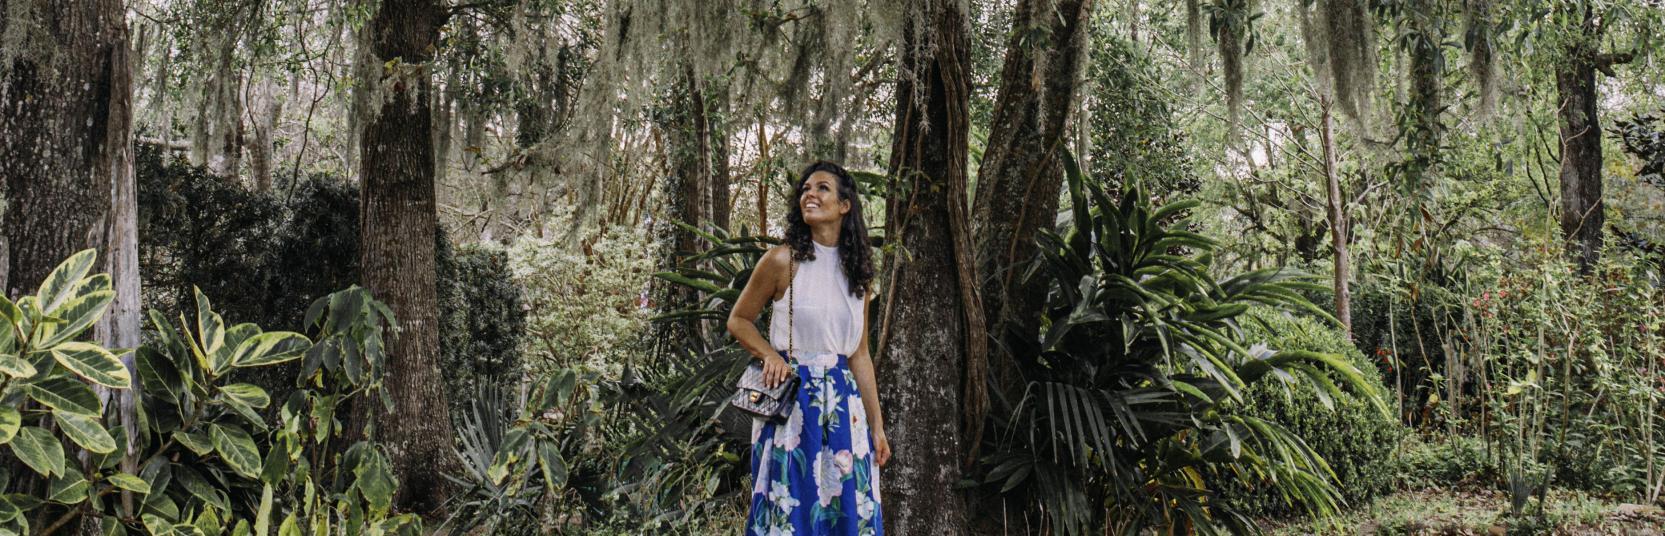 big thicket